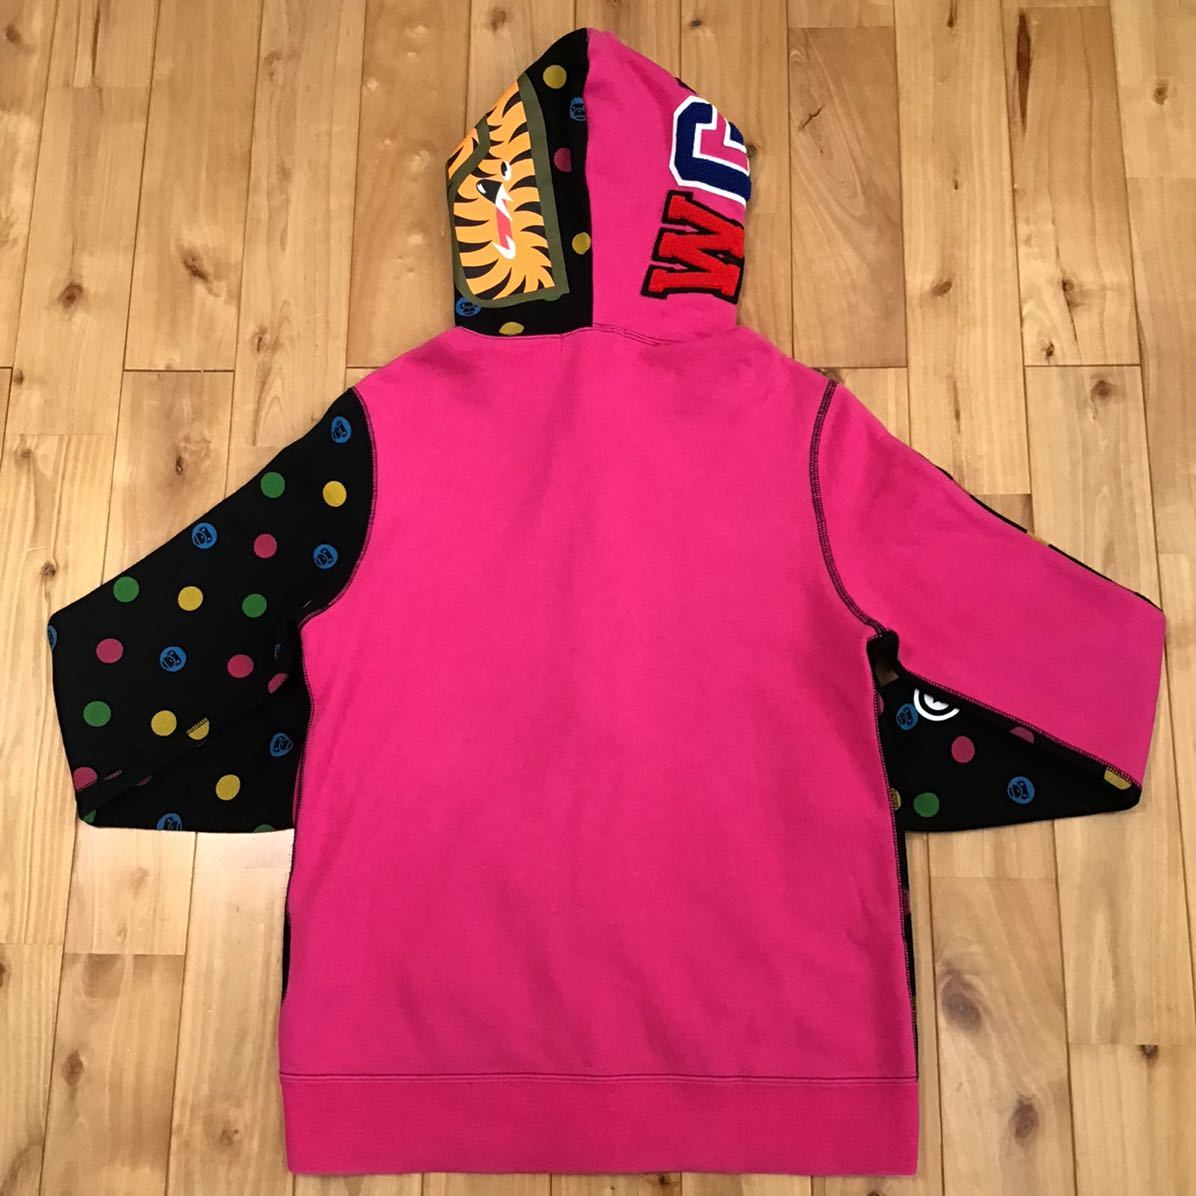 Dot milo シャーク パーカー レディース Sサイズ a bathing ape BAPE shark full zip hoodie エイプ ベイプ マイロ ladies pink